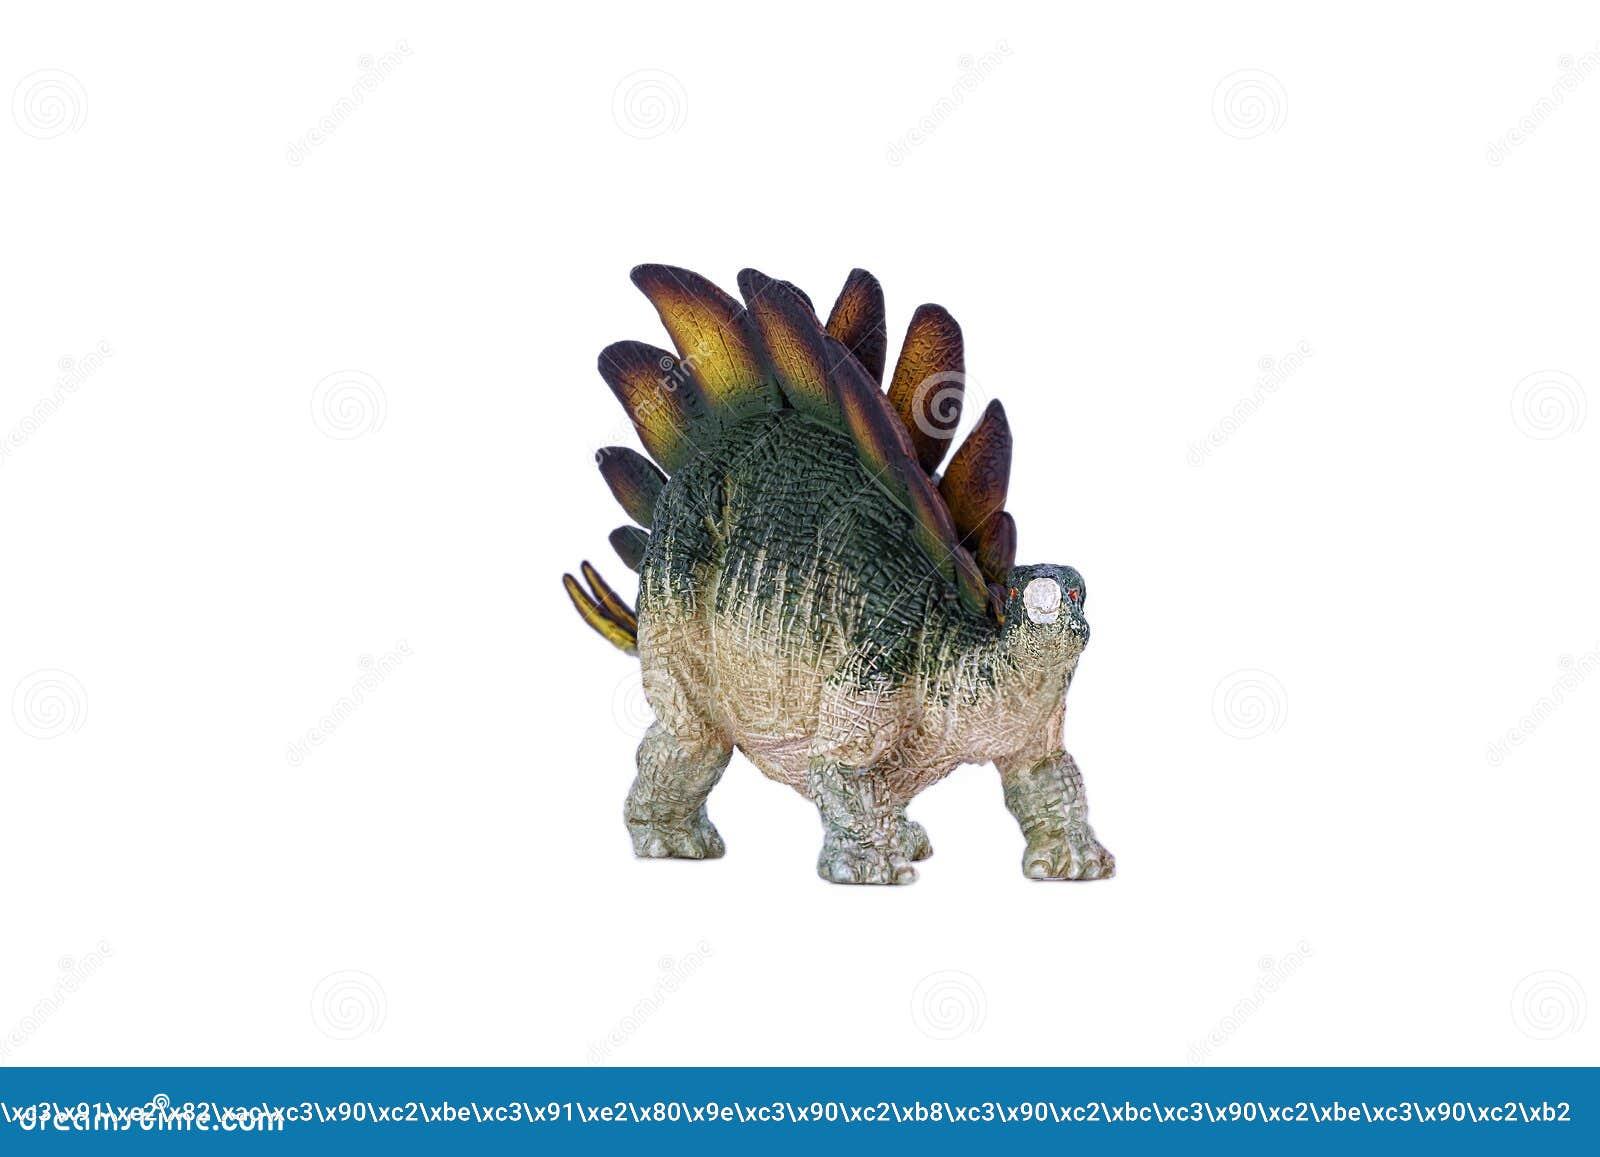 Toy Stegosaurus Dinosaur